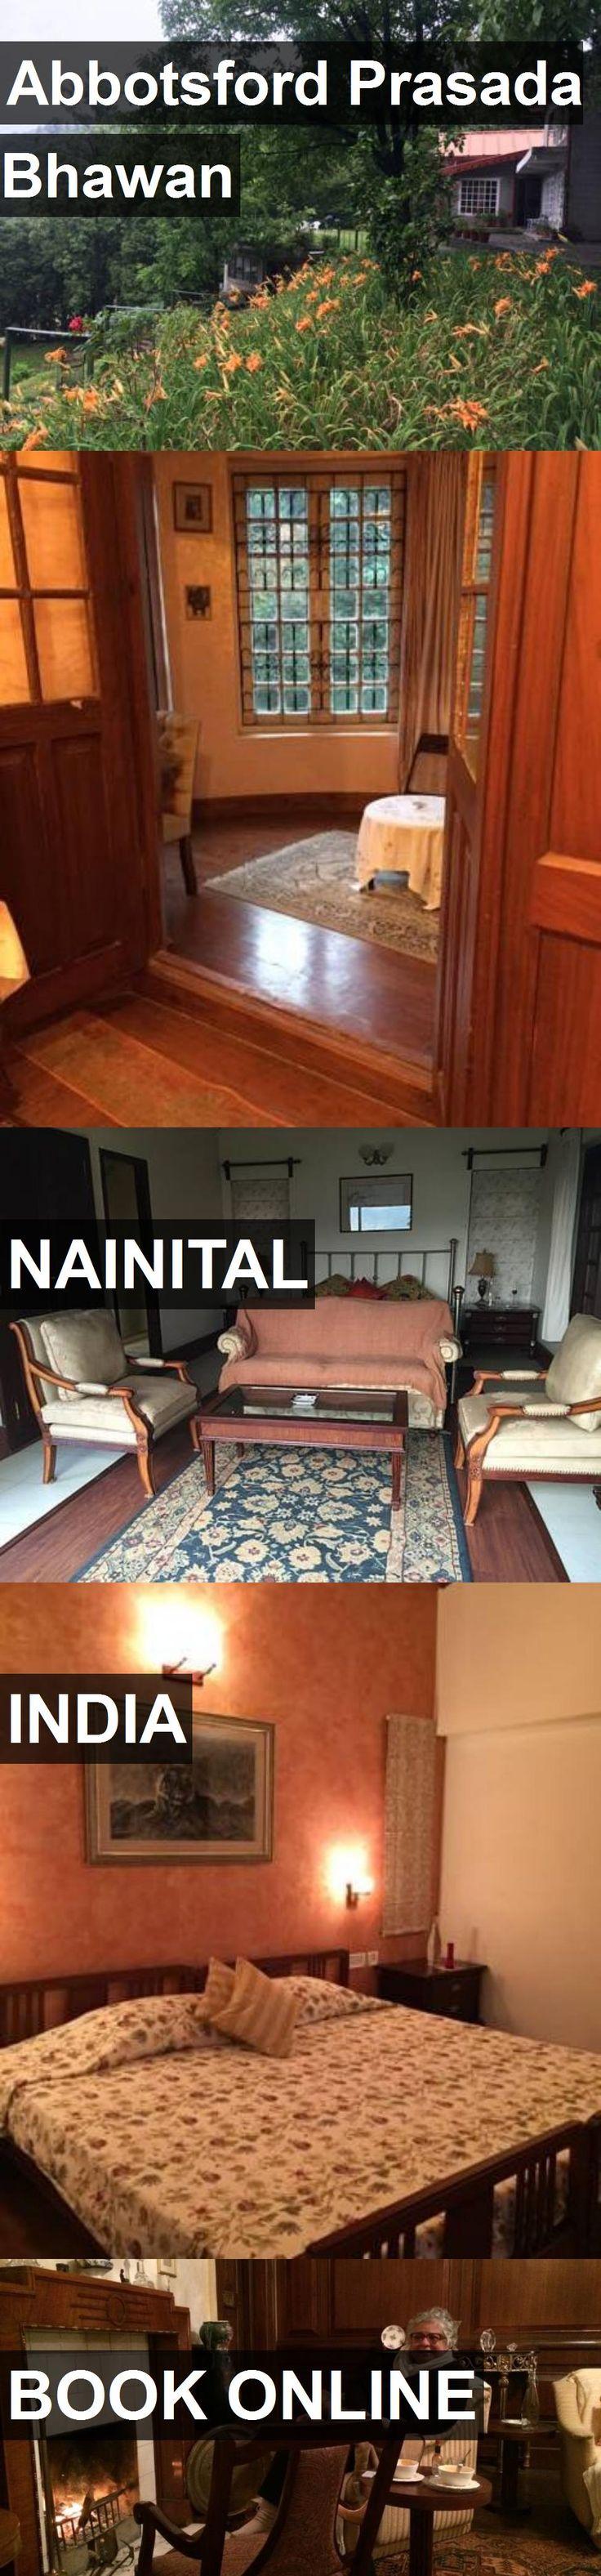 Hotel Abbotsford Prasada Bhawan in Nainital, India. For more information, photos, reviews and best prices please follow the link. #India #Nainital #travel #vacation #hotel